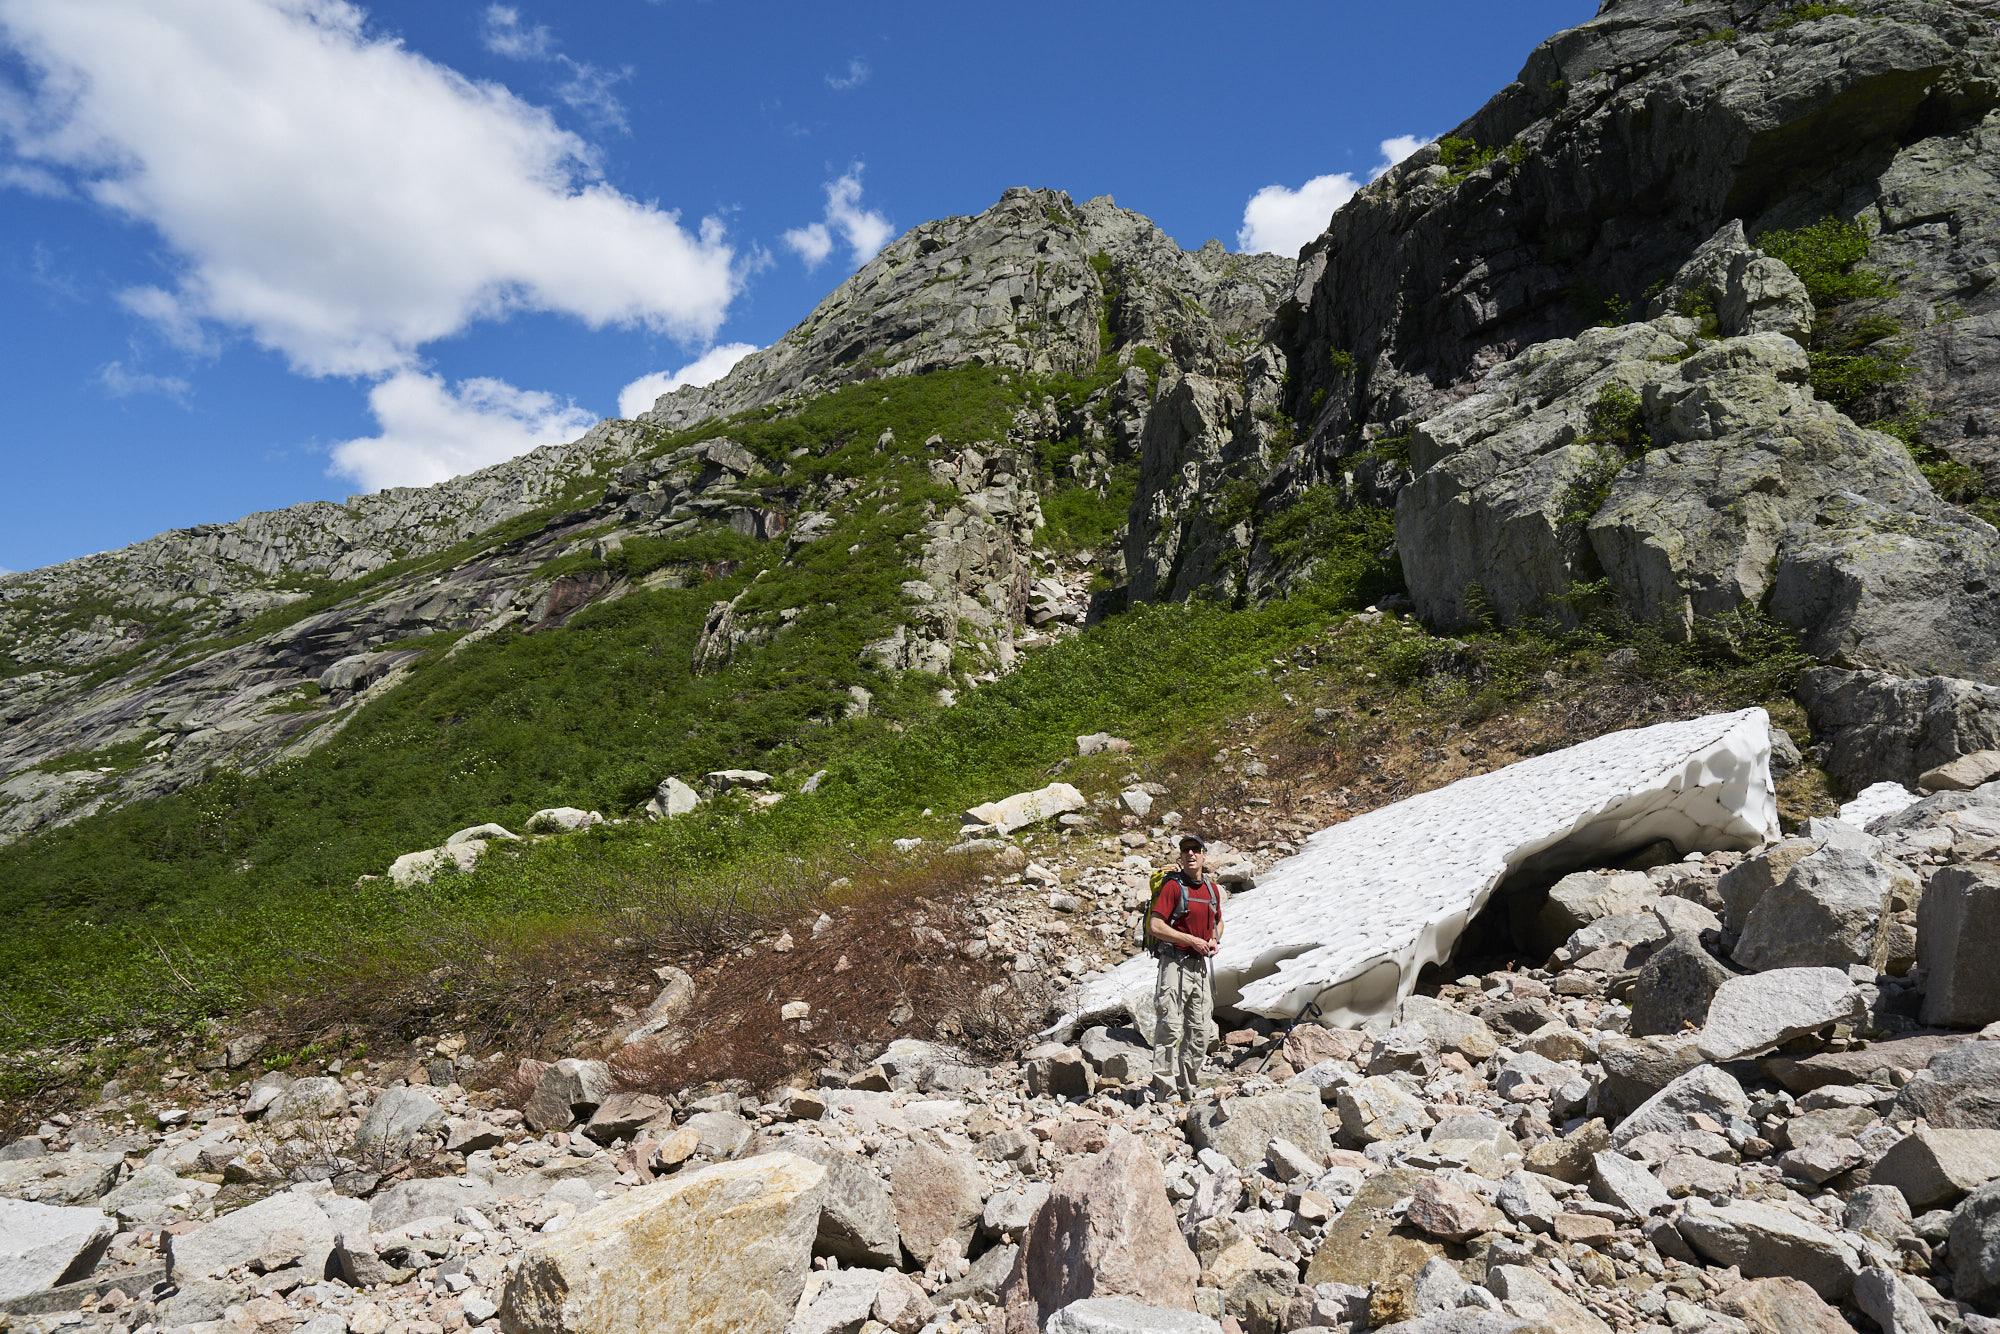 Pamola ridge rises through the center-left of the photo.